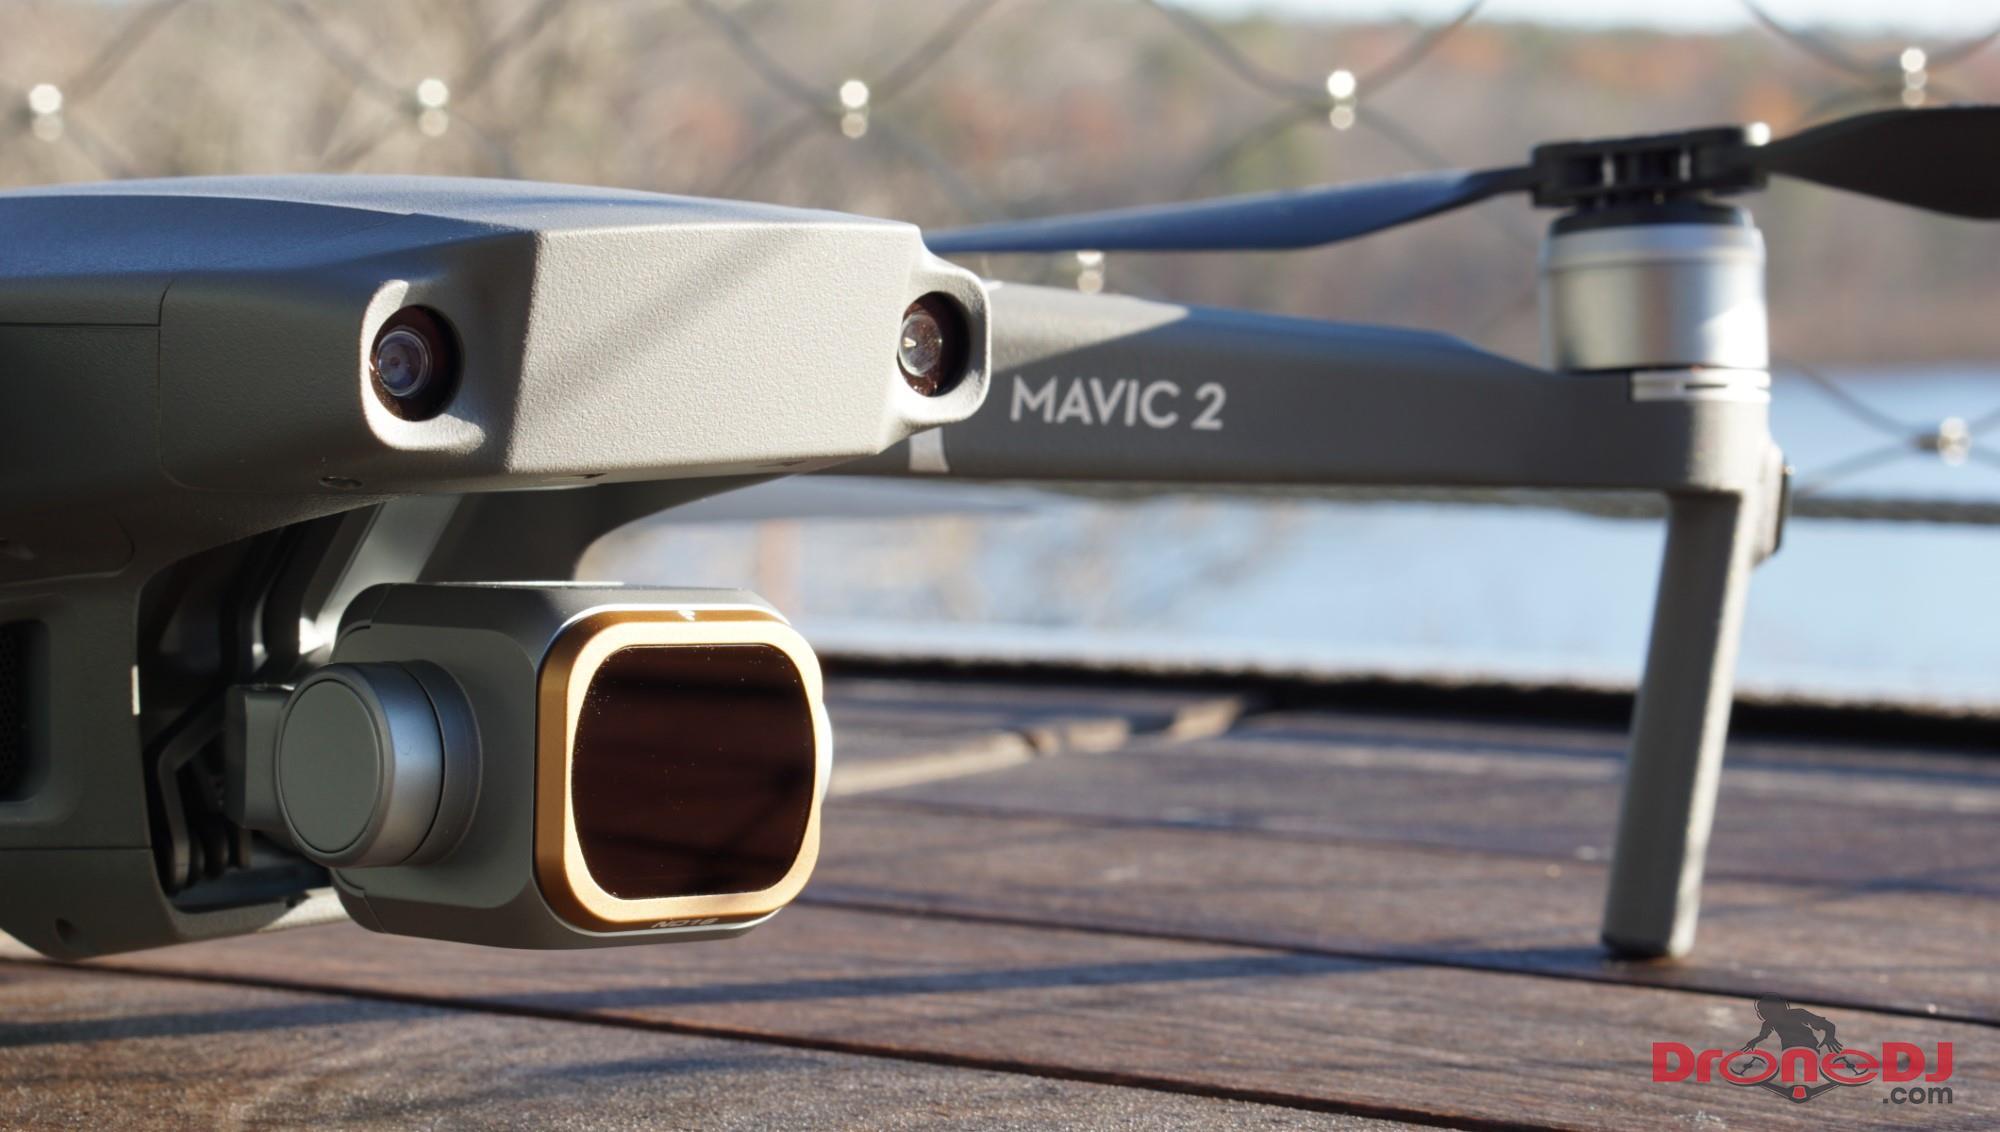 Mavic 2 Pro with polar pro filter